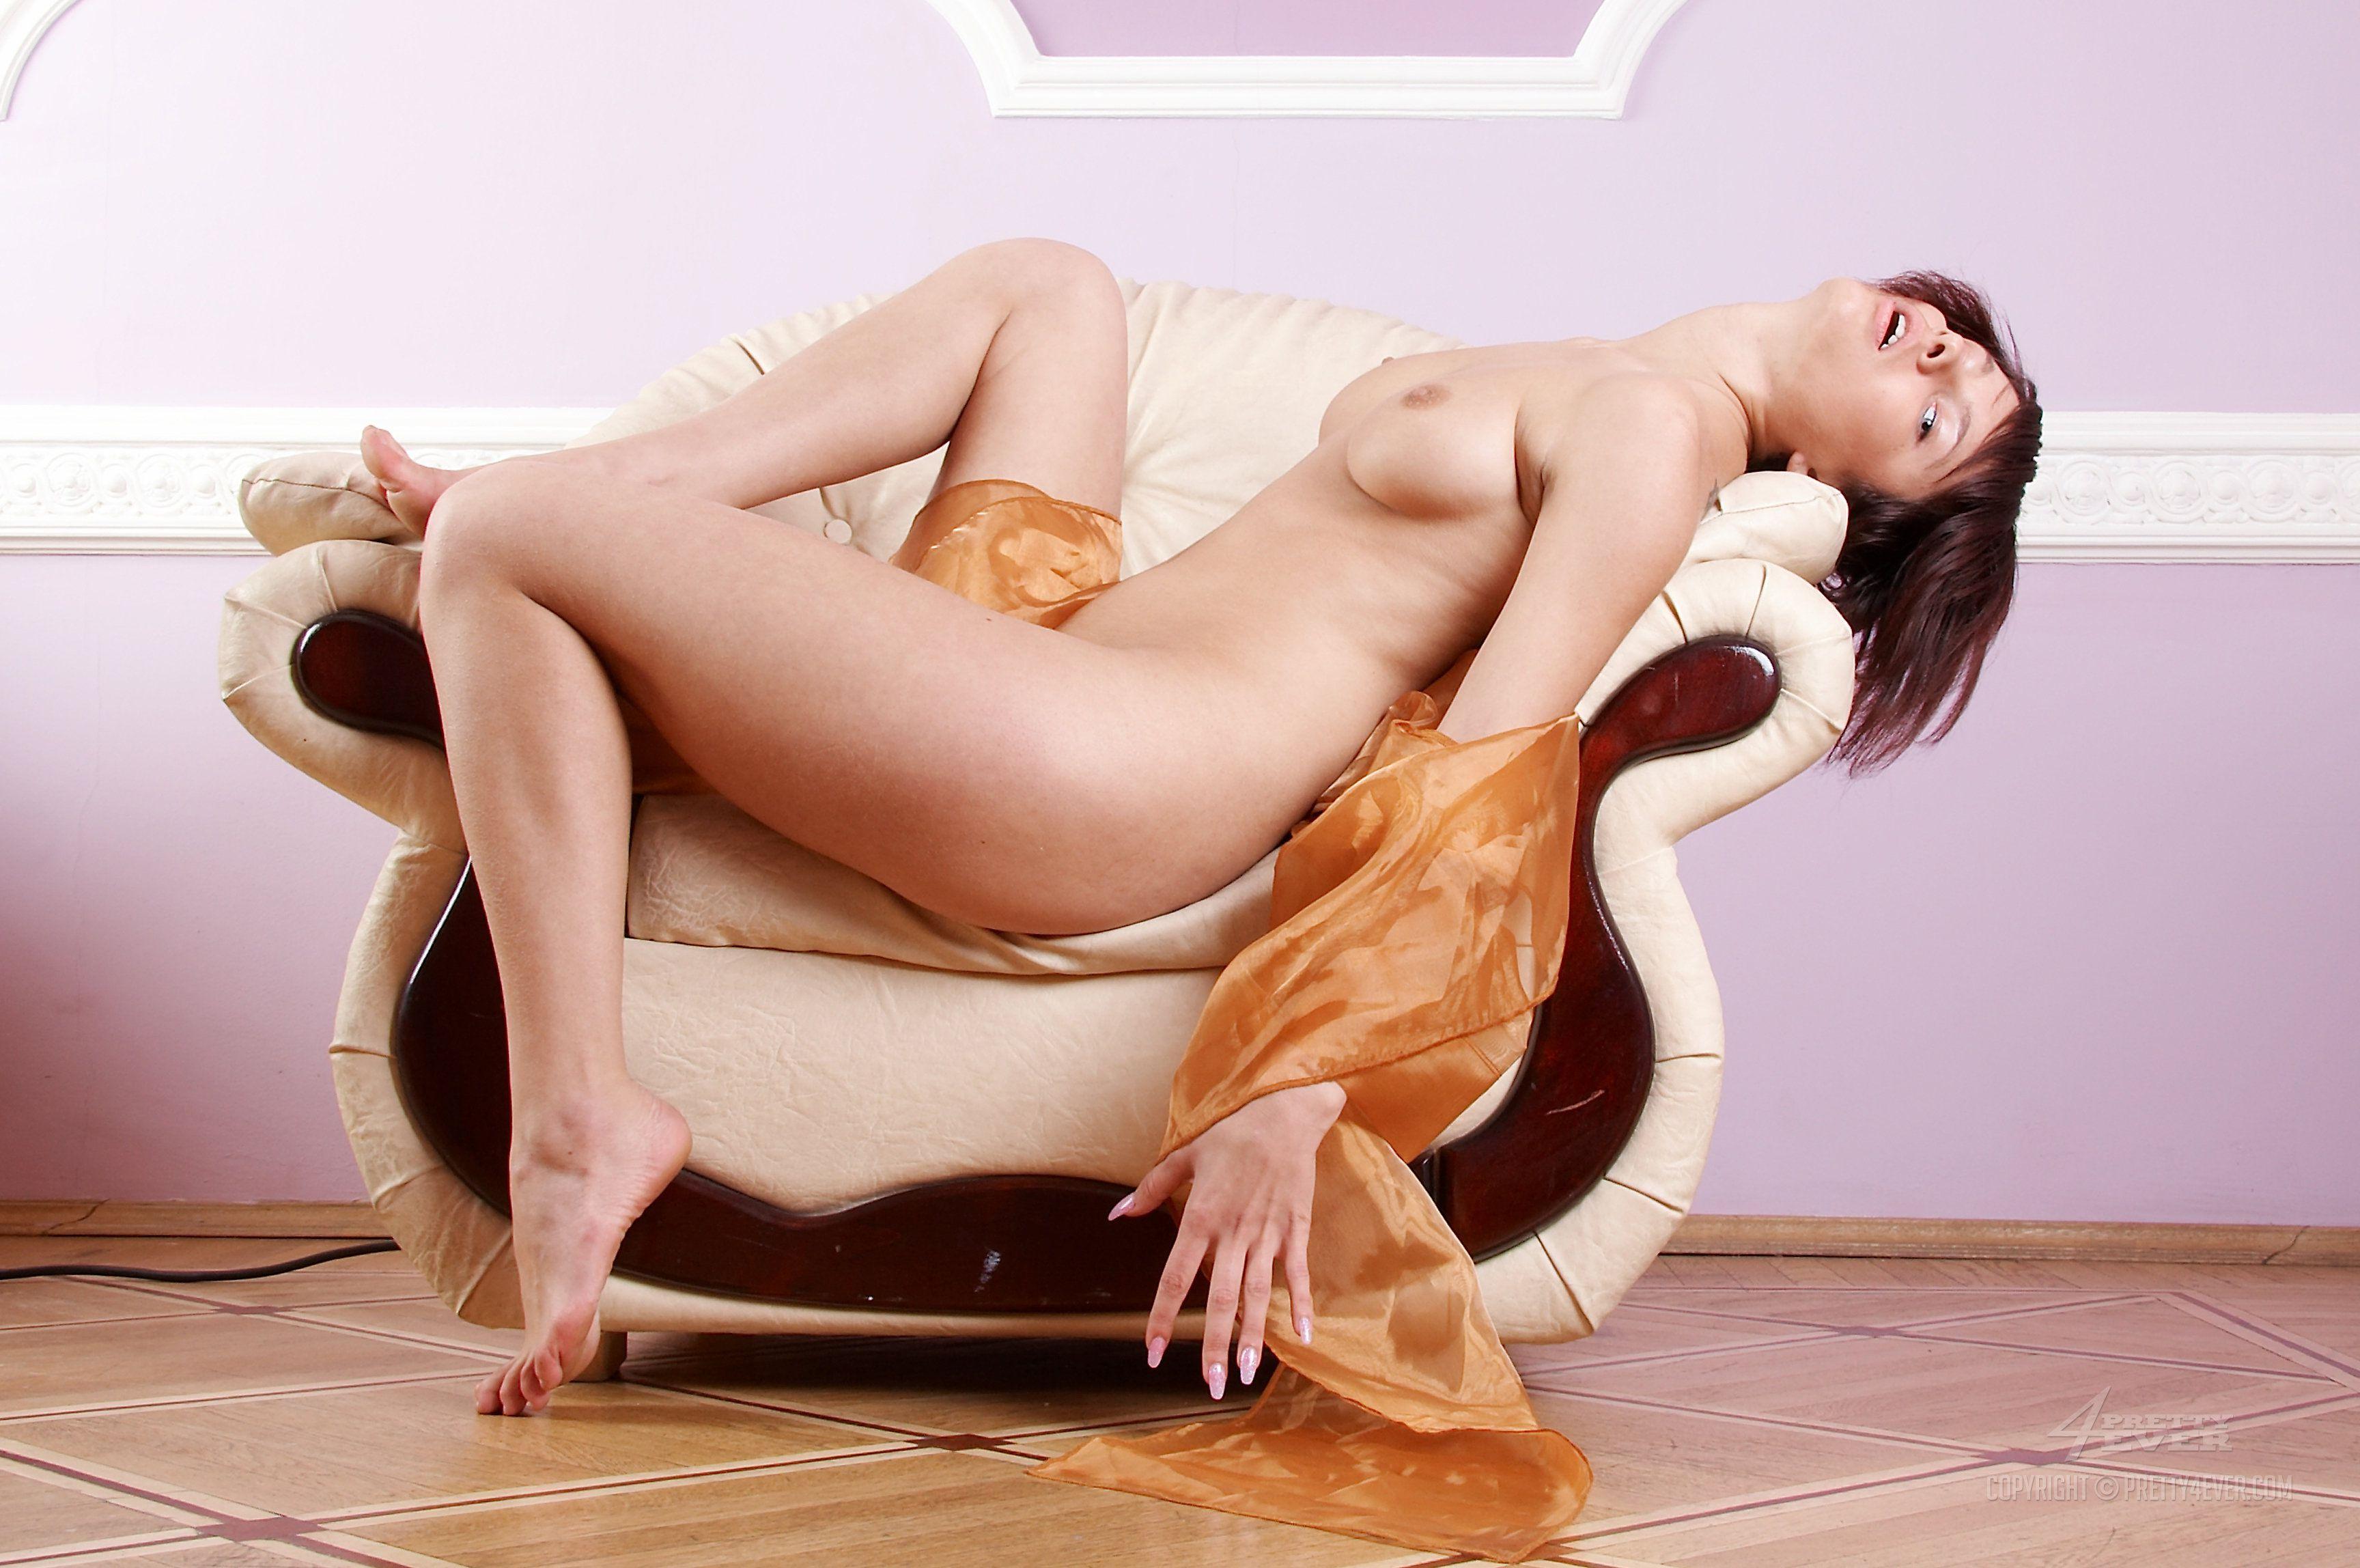 http://i3.imageban.ru/out/2013/05/23/f6fe41a33928f5a5416e9e791a5efb94.jpg